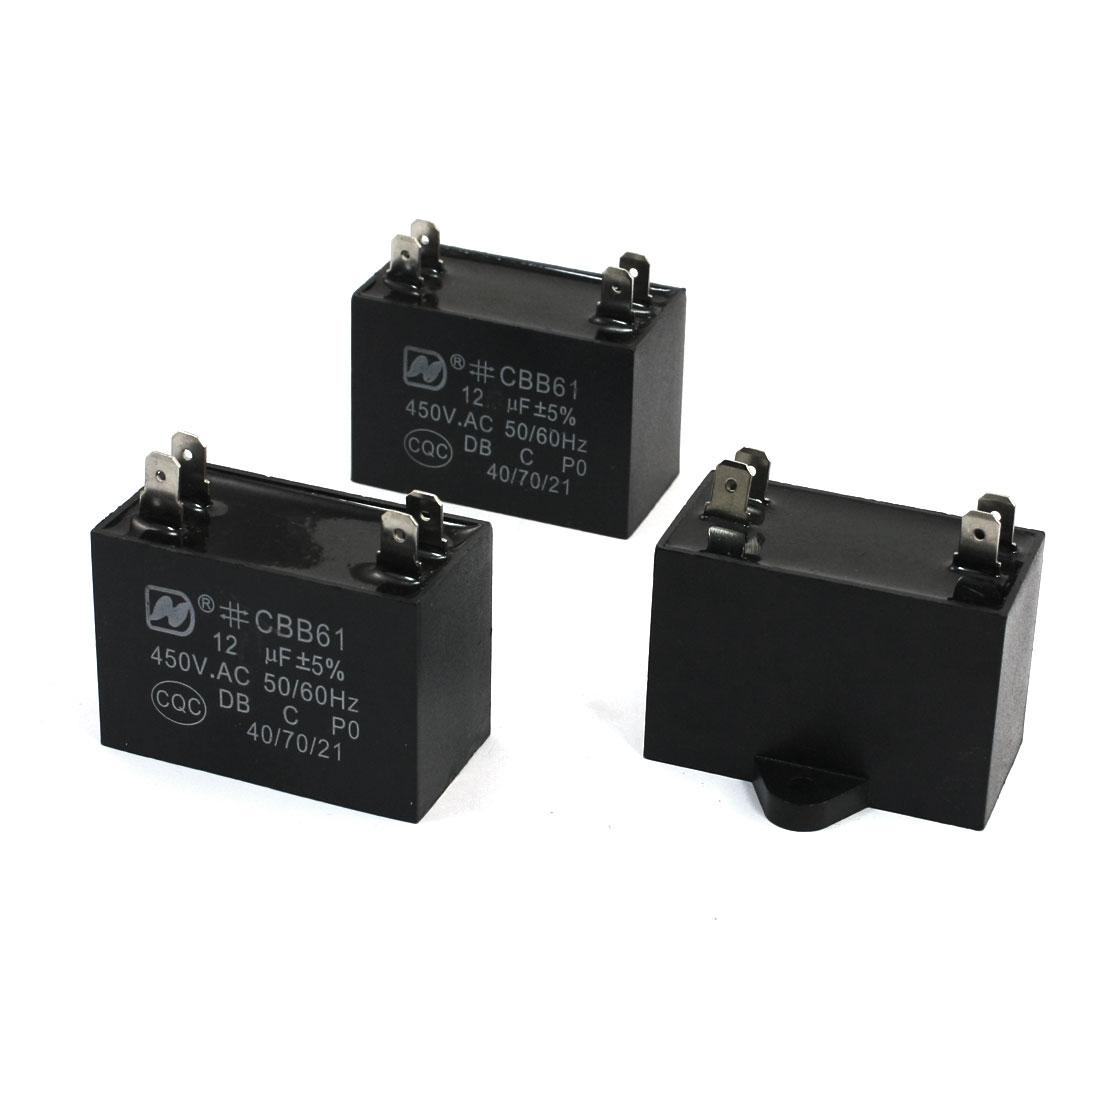 AC 450V 12uF 4 Pins Air Conditioner Motor Run Capacitor Black 3Pcs